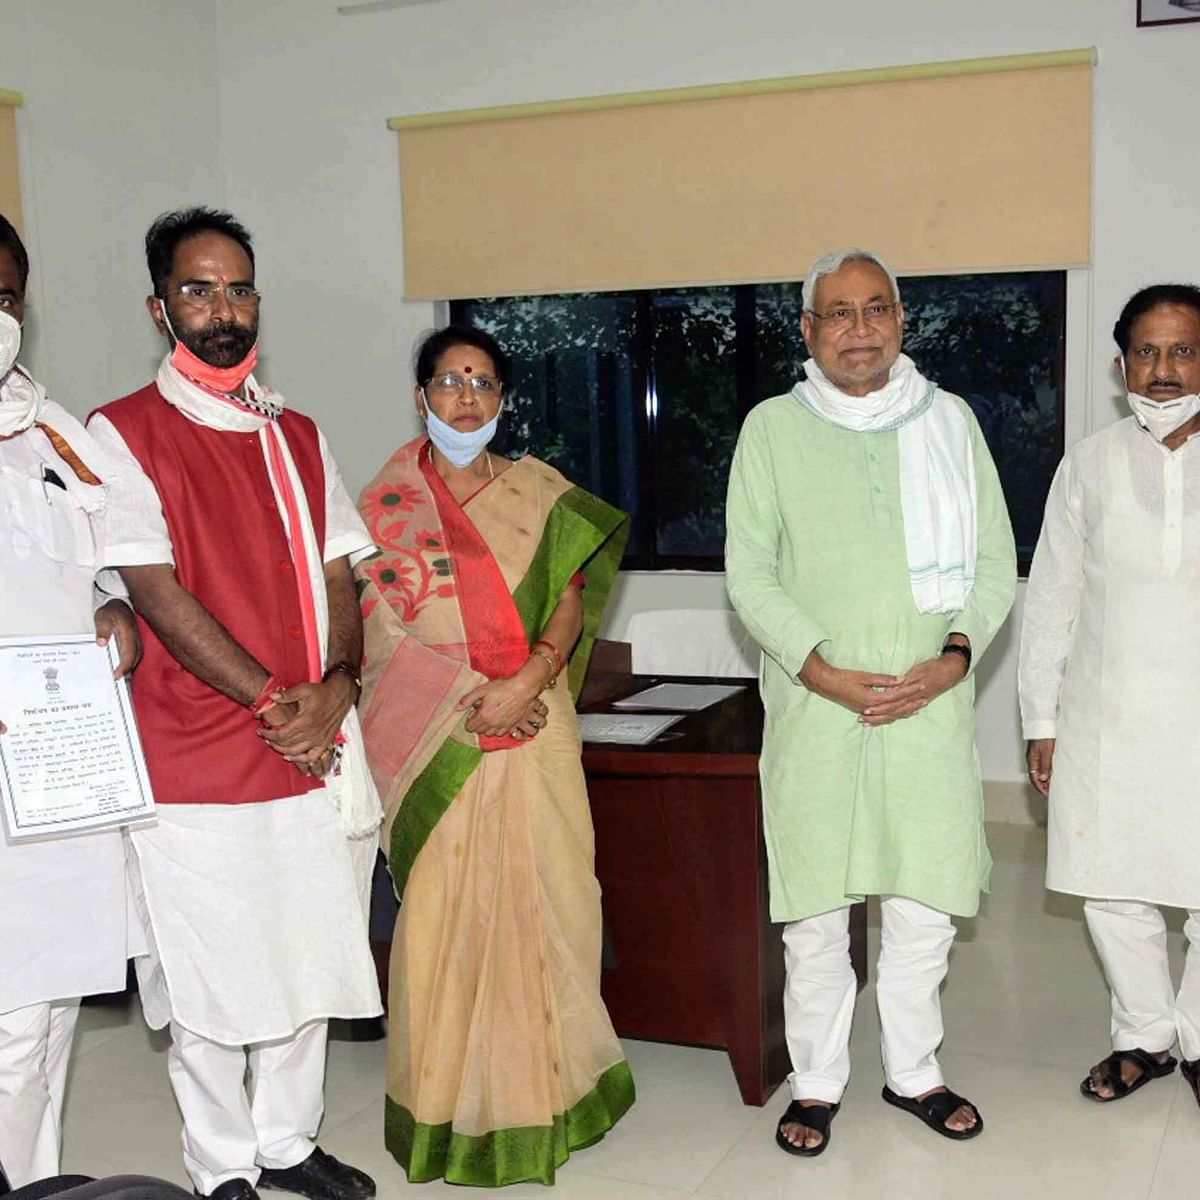 From Sanjay Mayukh to Sameer Kumar Singh: Nine candidates elected unopposed to Bihar Legislative Council